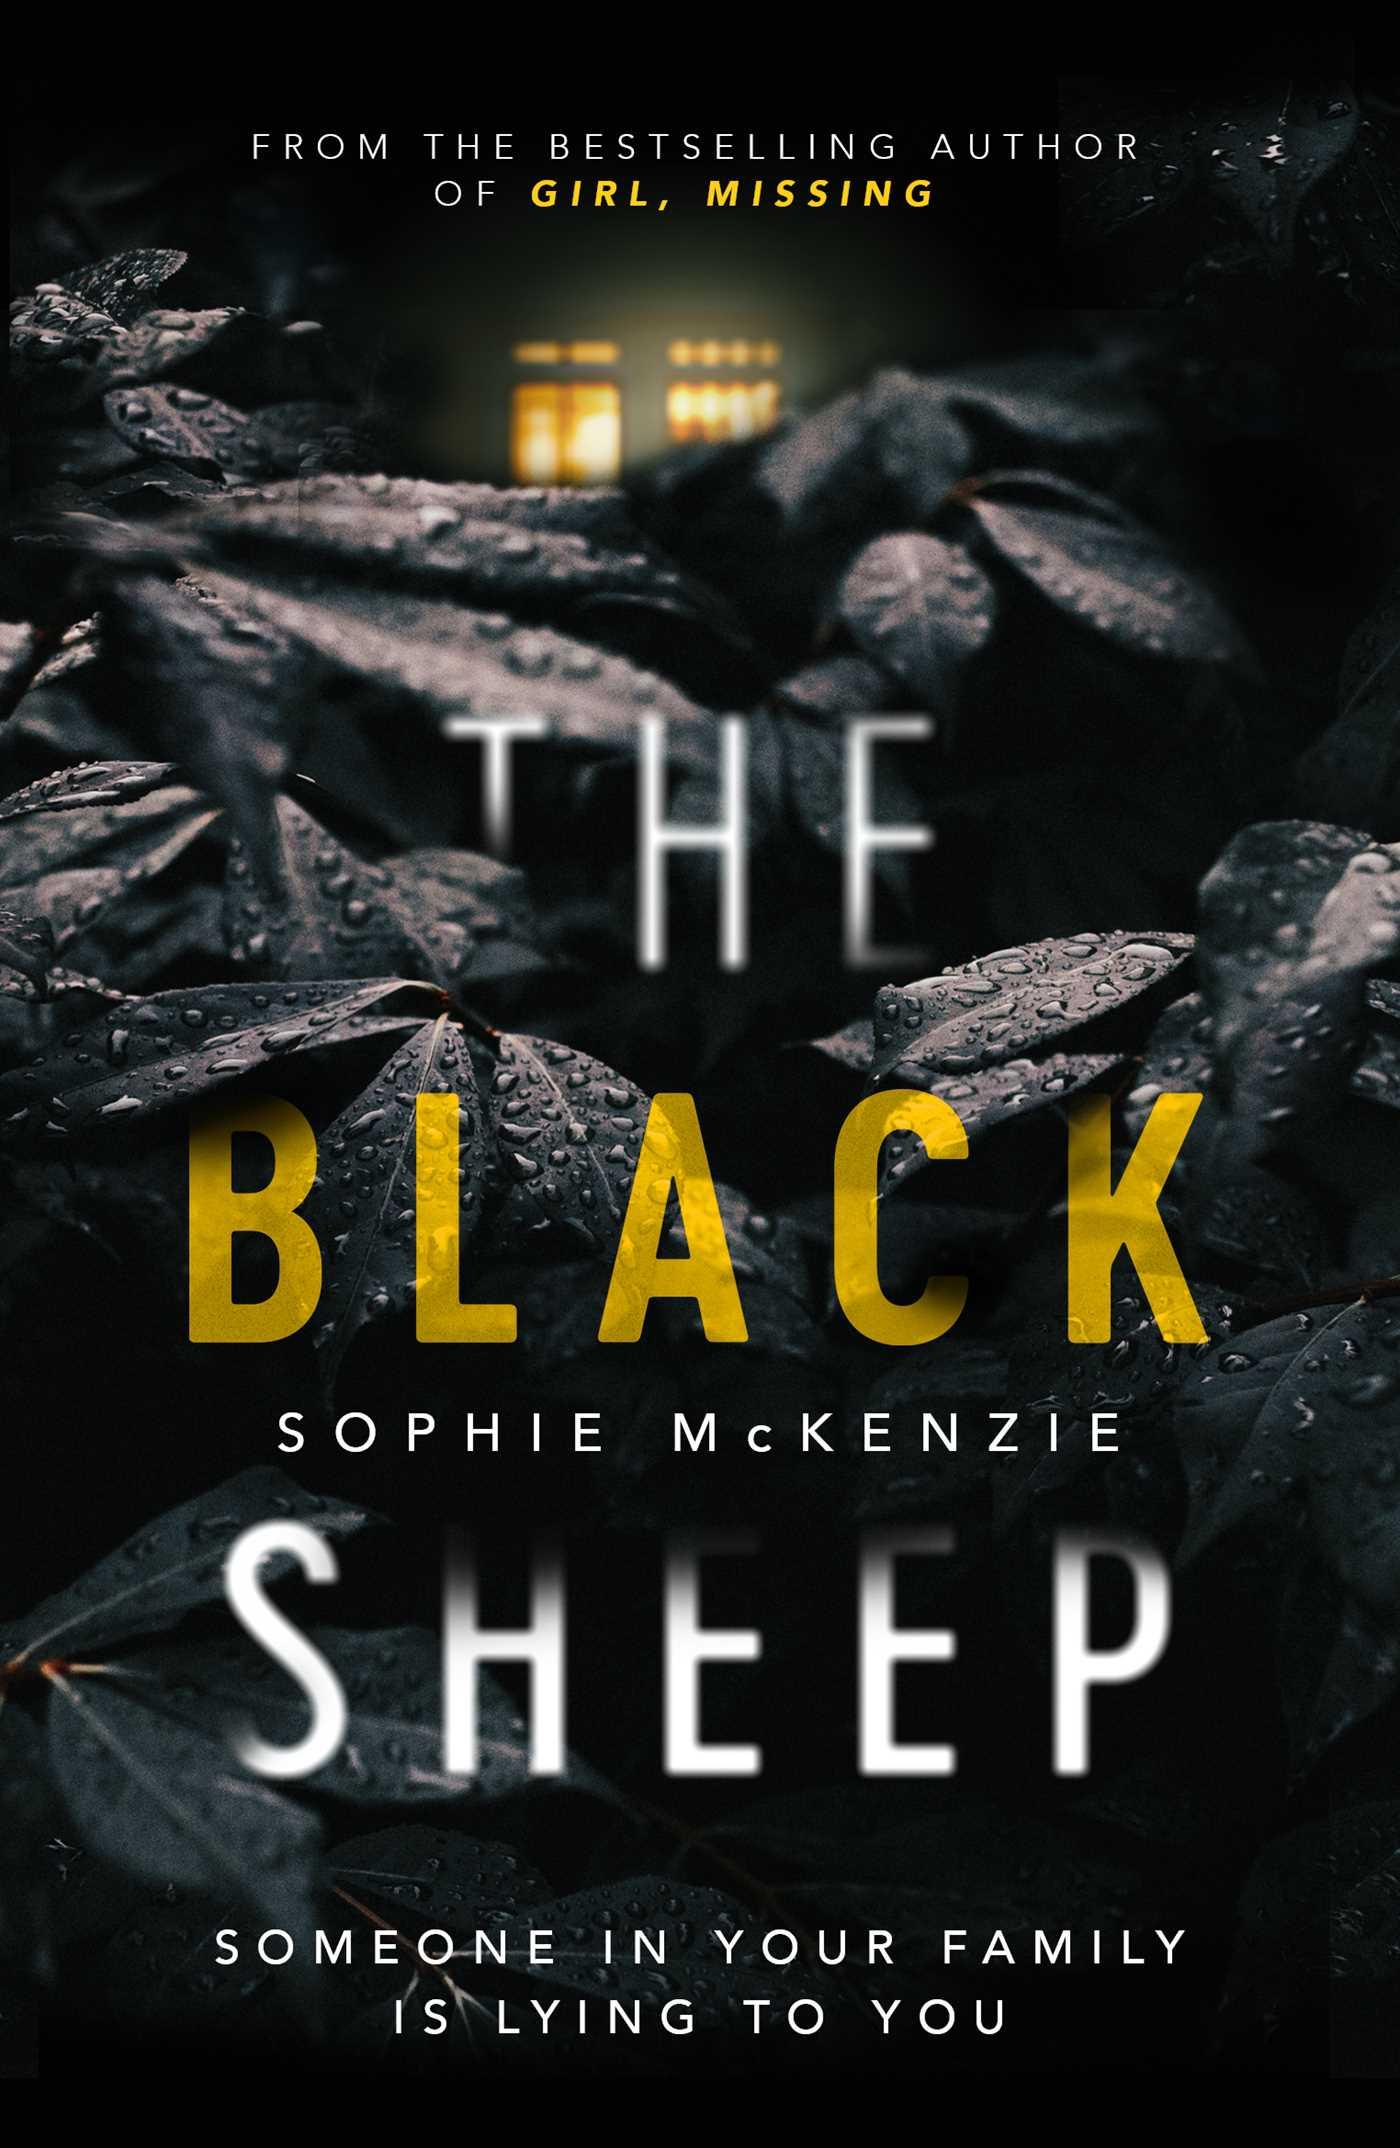 The black sheep 9781471133220 hr